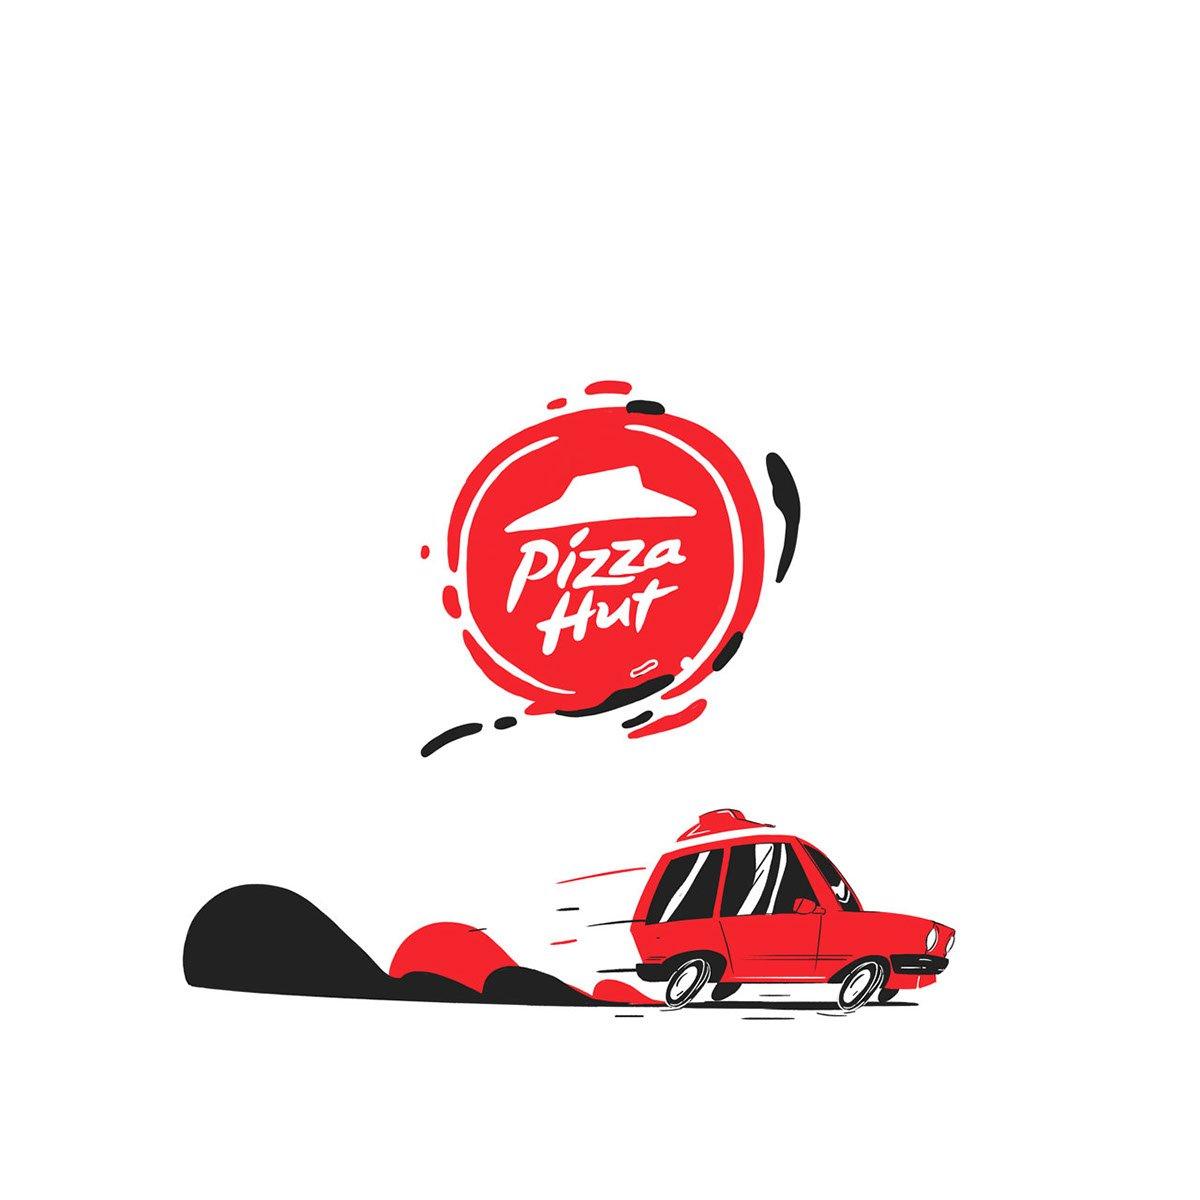 idesign pizzahut 01